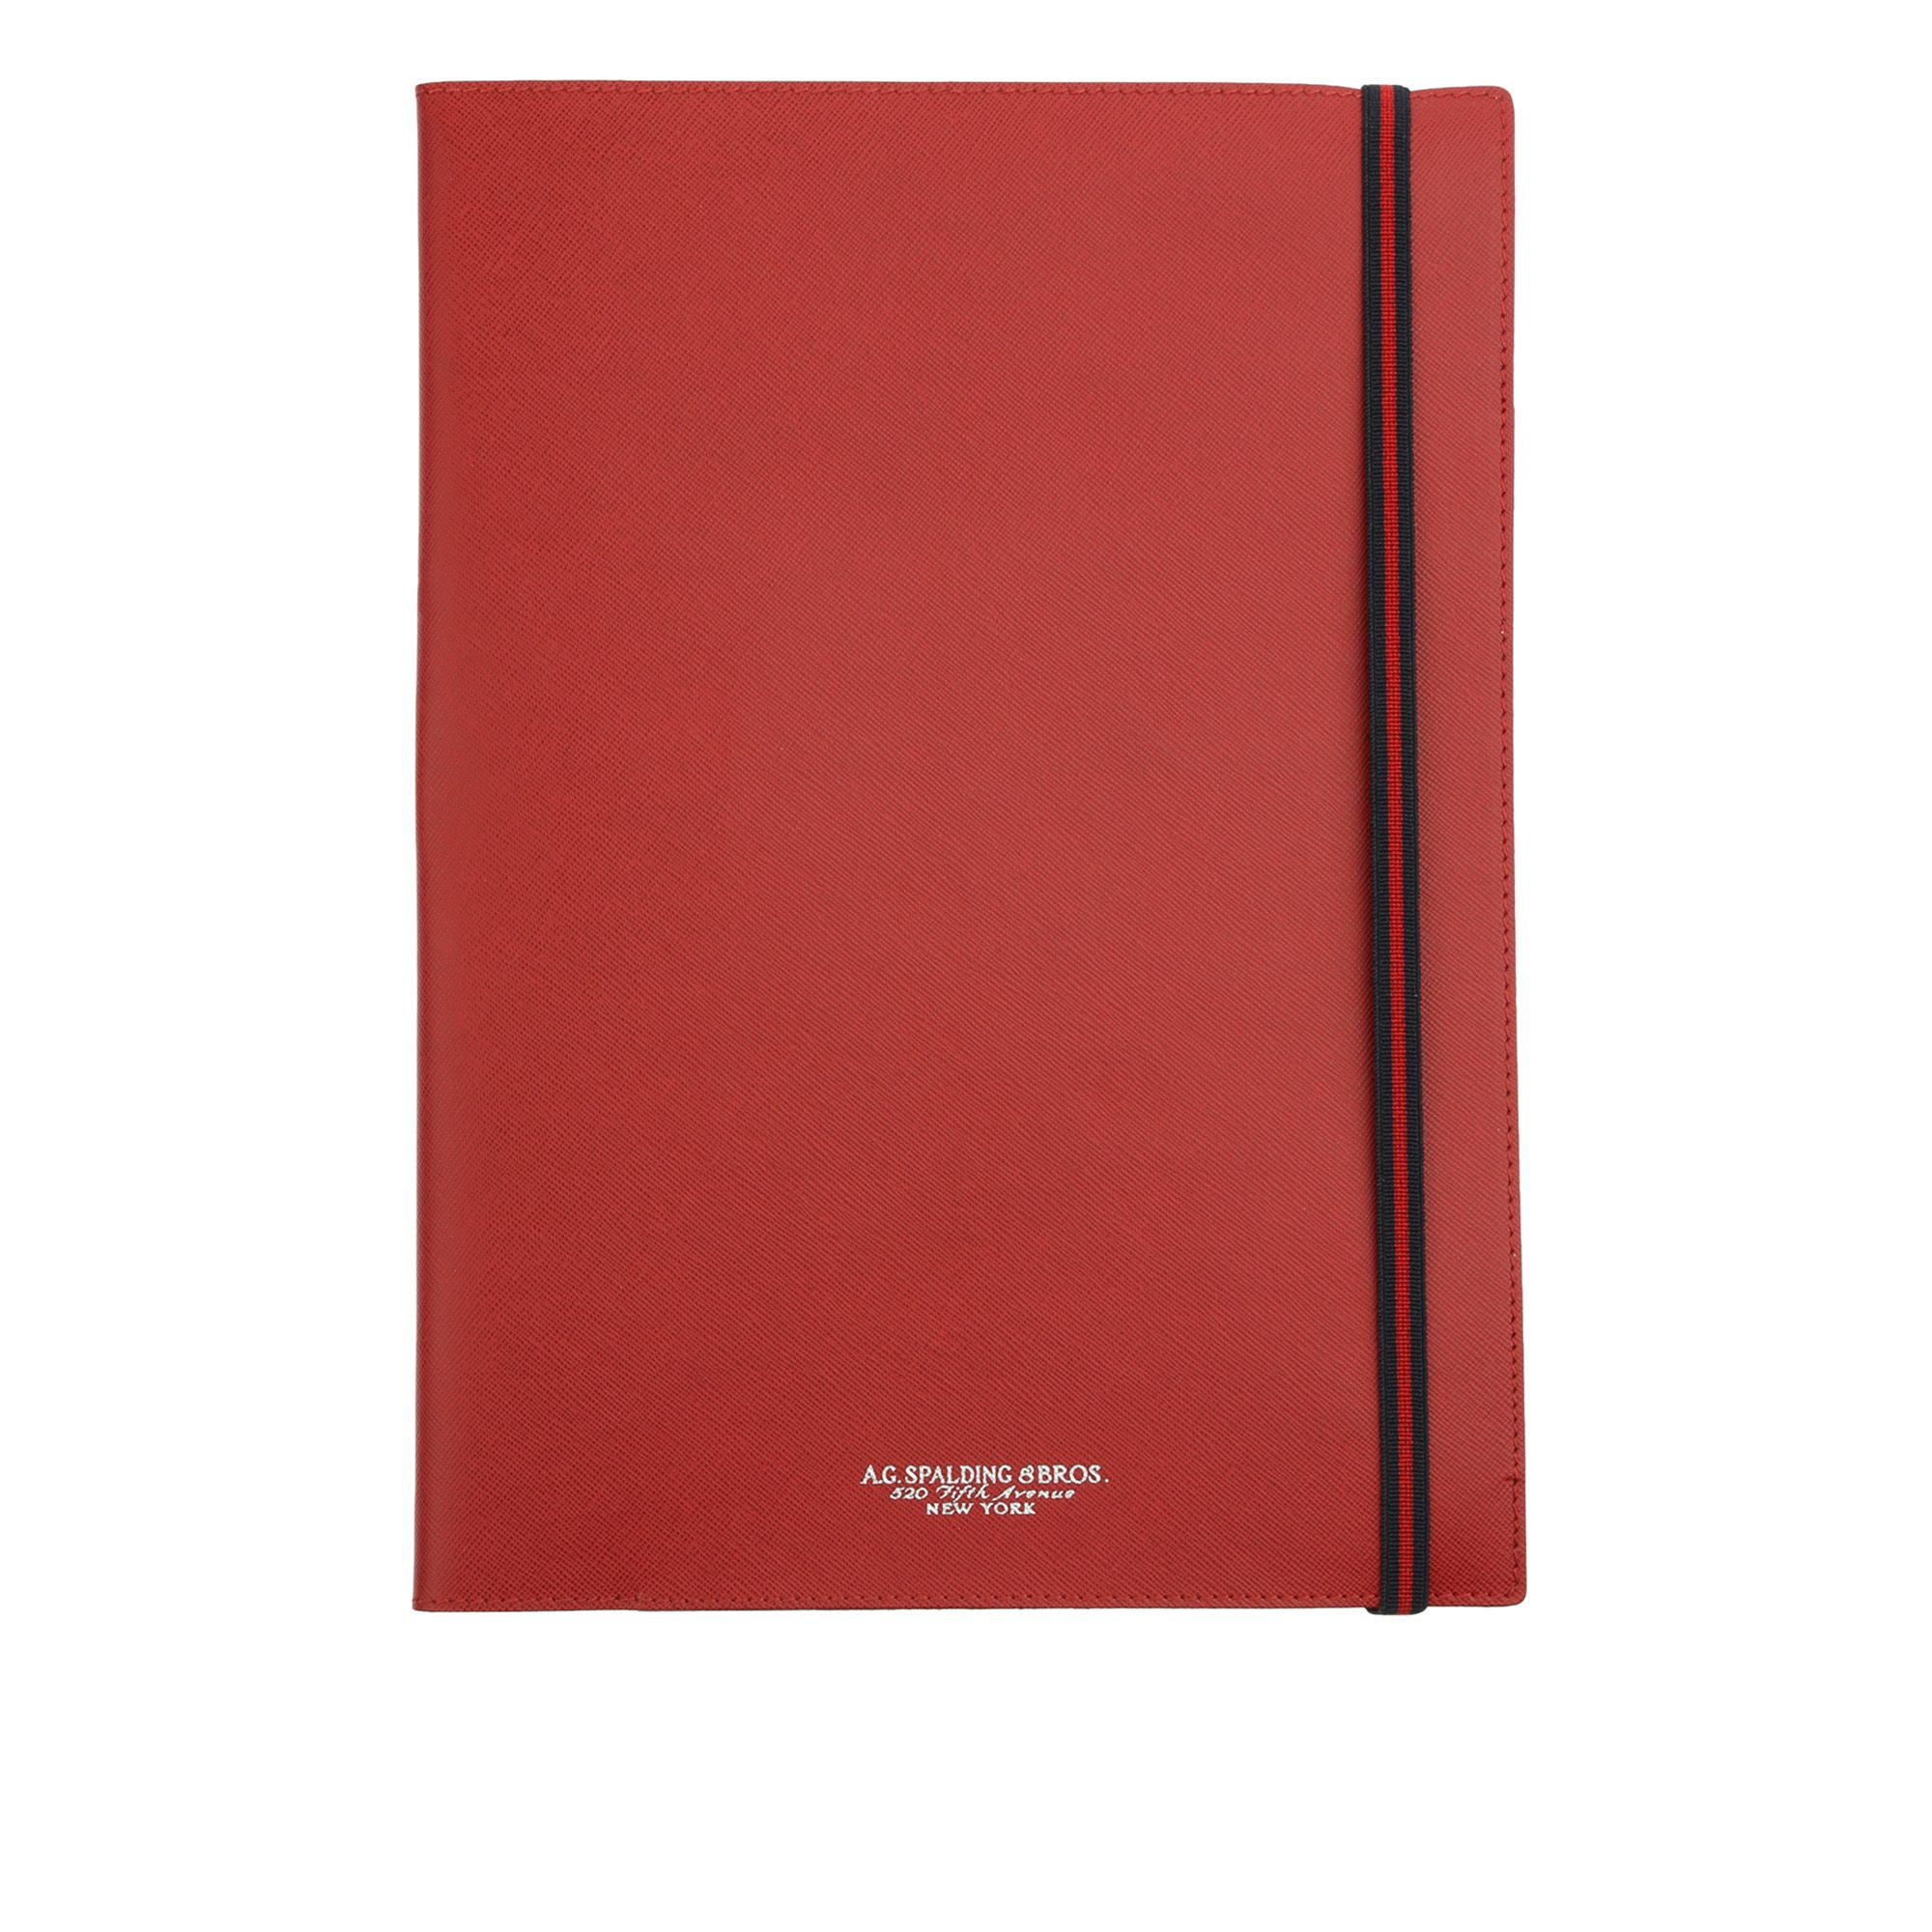 AG Spalding & Bros New easy PortaBlocco Rosso